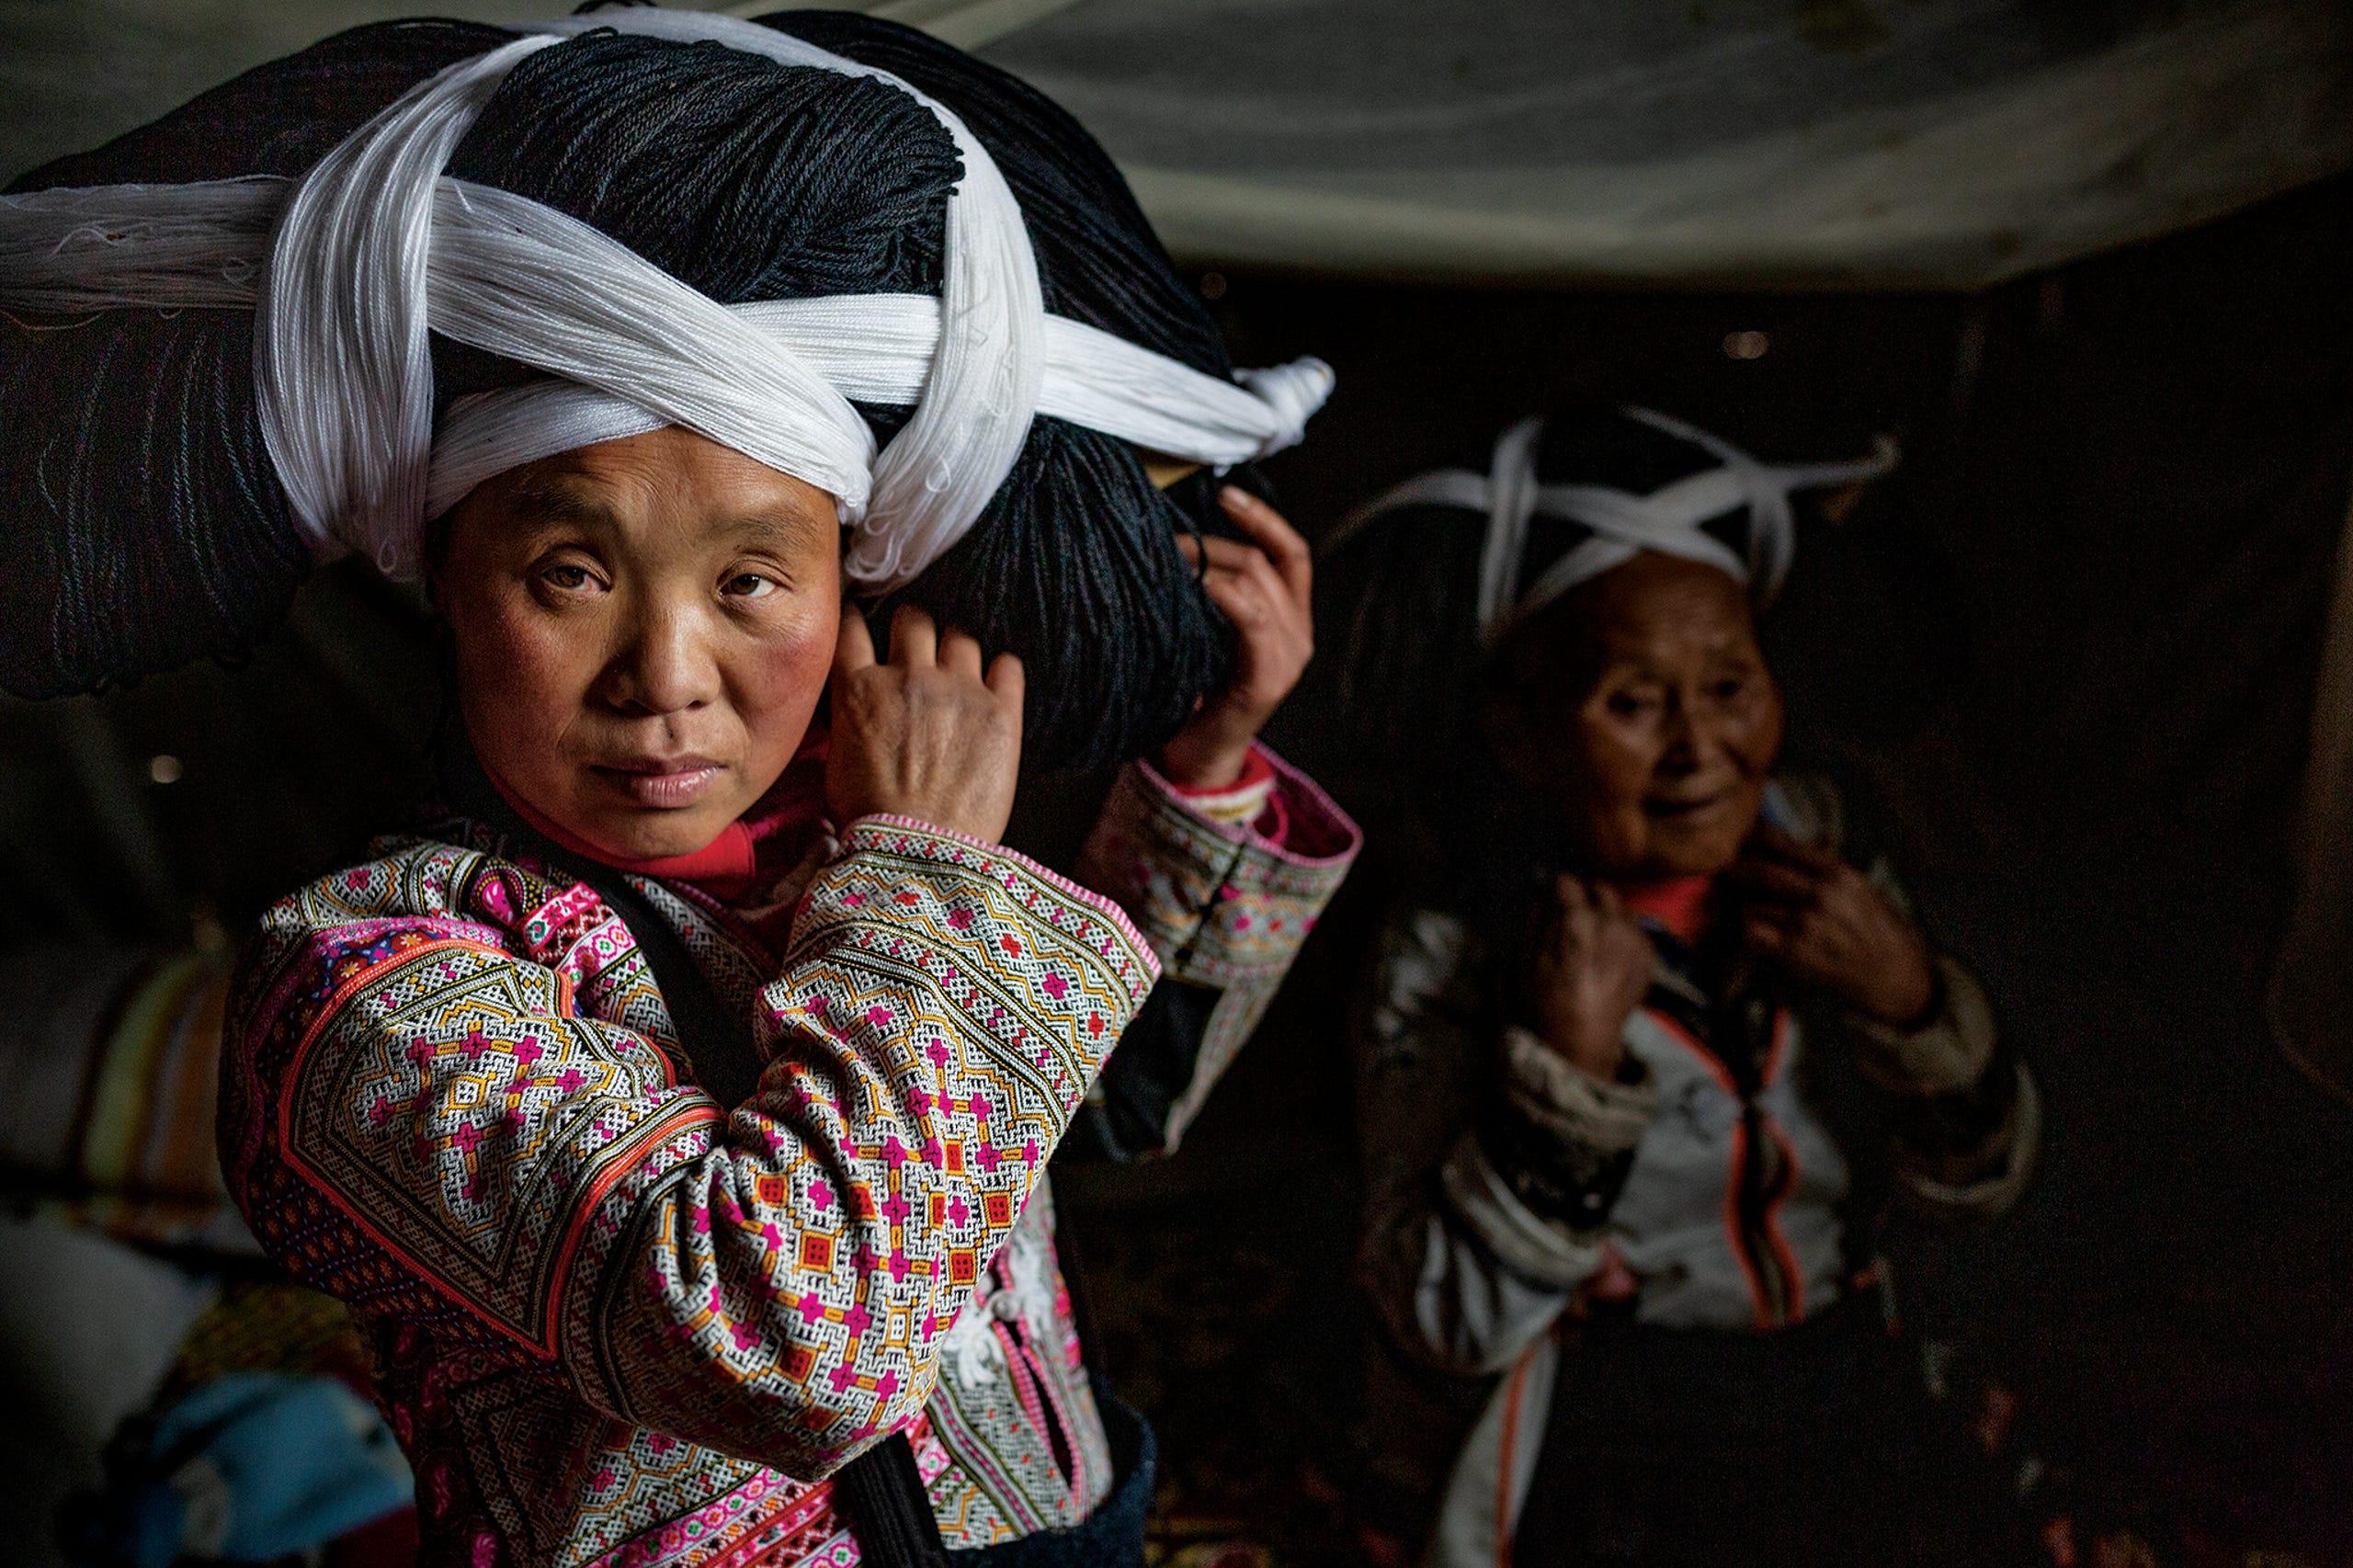 نتيجة بحث الصور عن Women of the Longhorn Miao tribe in Guizhou province, China, wear elaborate headdresses of linen and wool on special occasions.